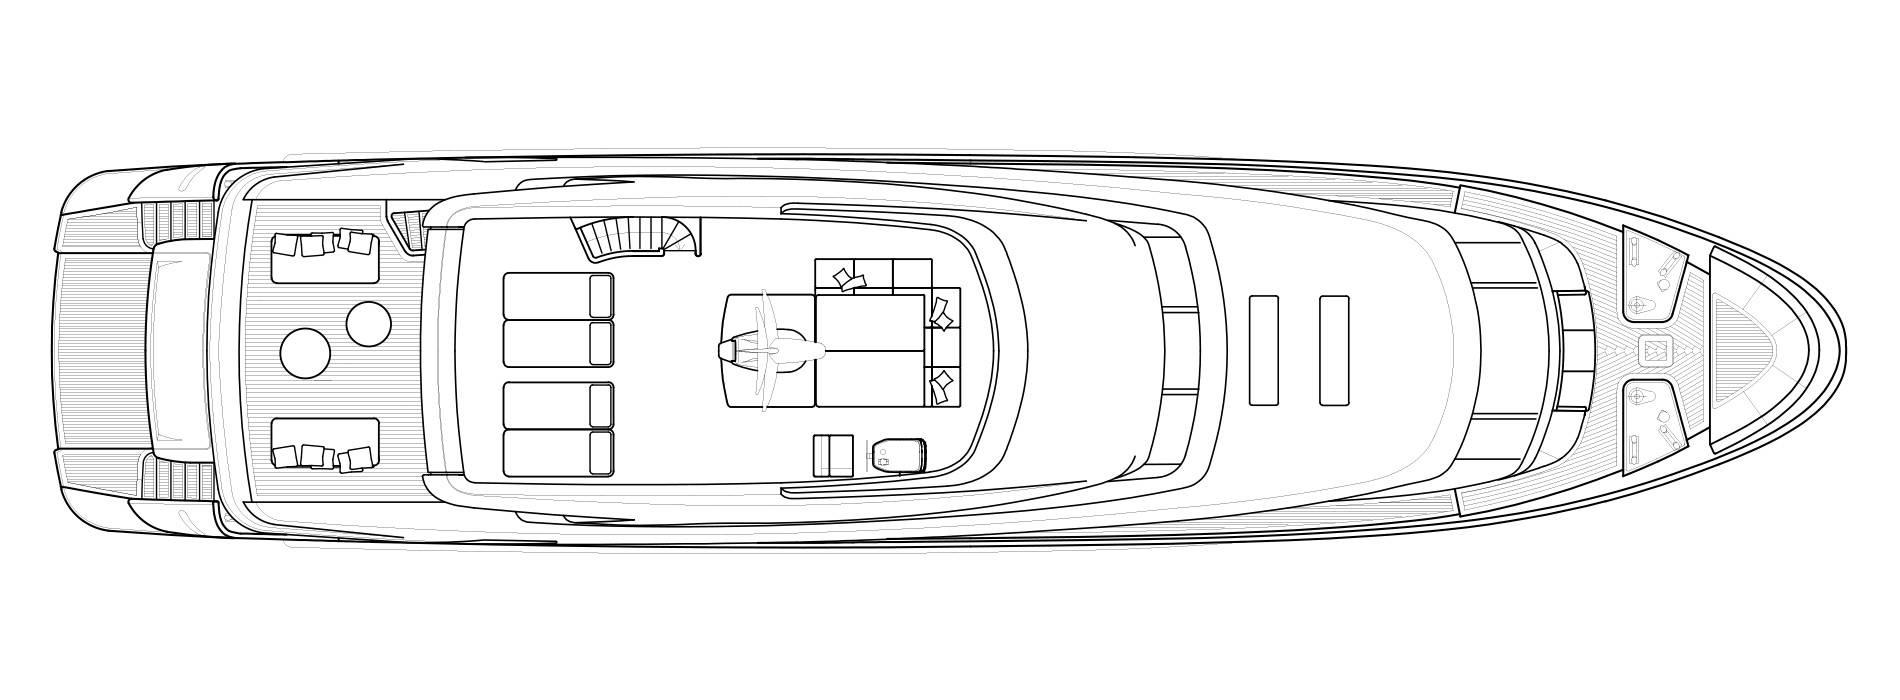 Sanlorenzo Yachts SD112 Flying bridge